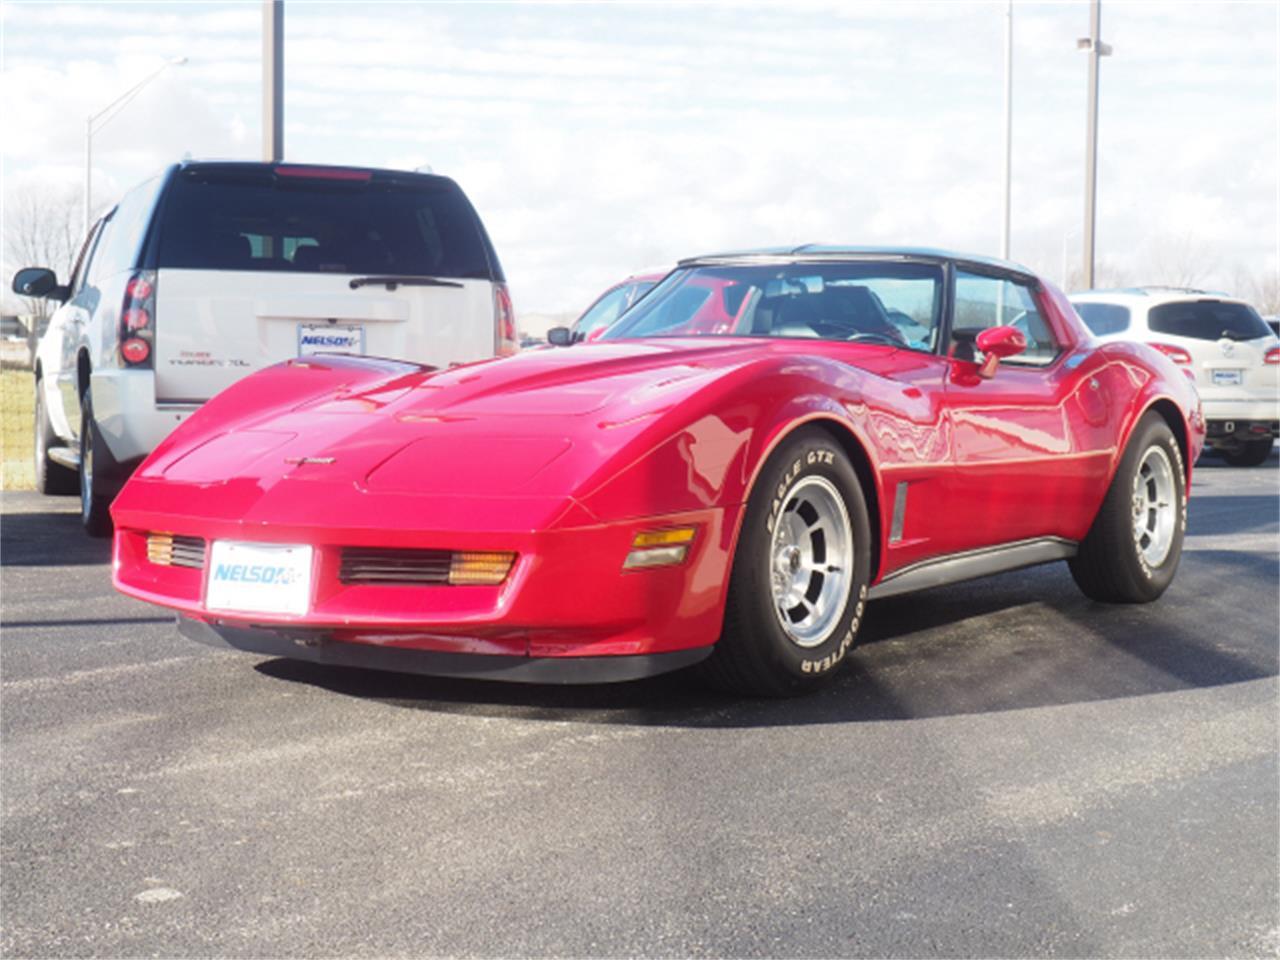 1981 Chevrolet Corvette (CC-1199564) for sale in Marysville, Ohio